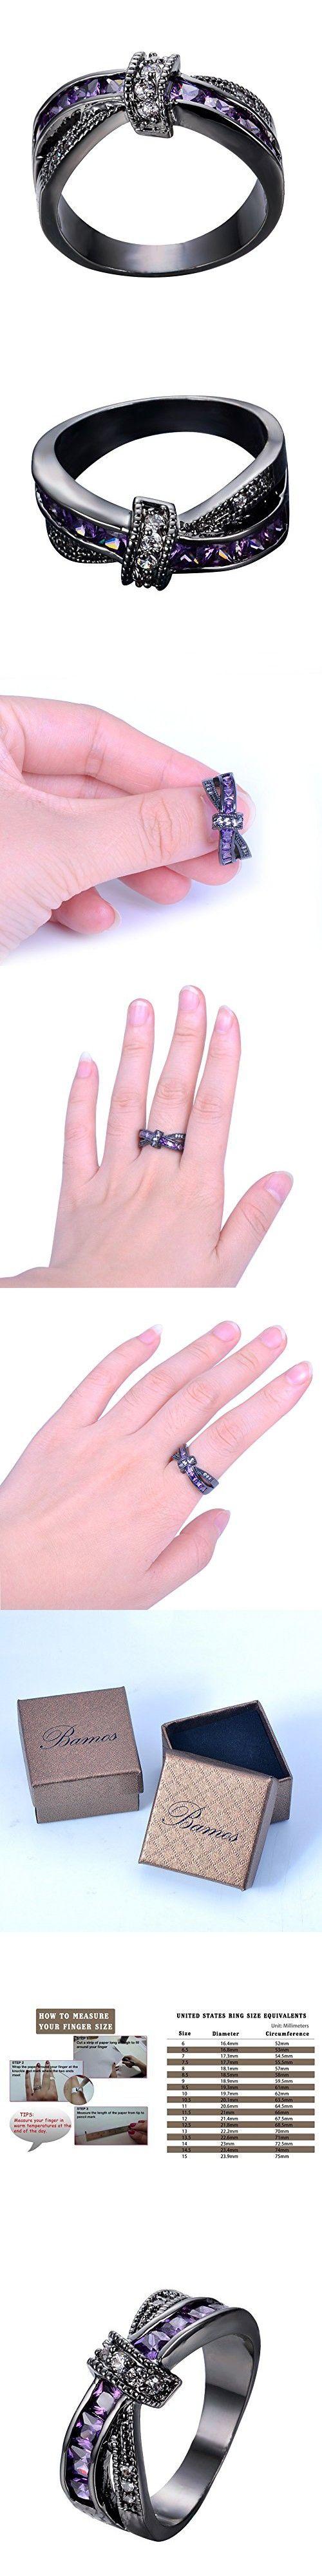 Bamos Jewelry Black Gold Purple Diamond Cut Halloween Best Friend ...